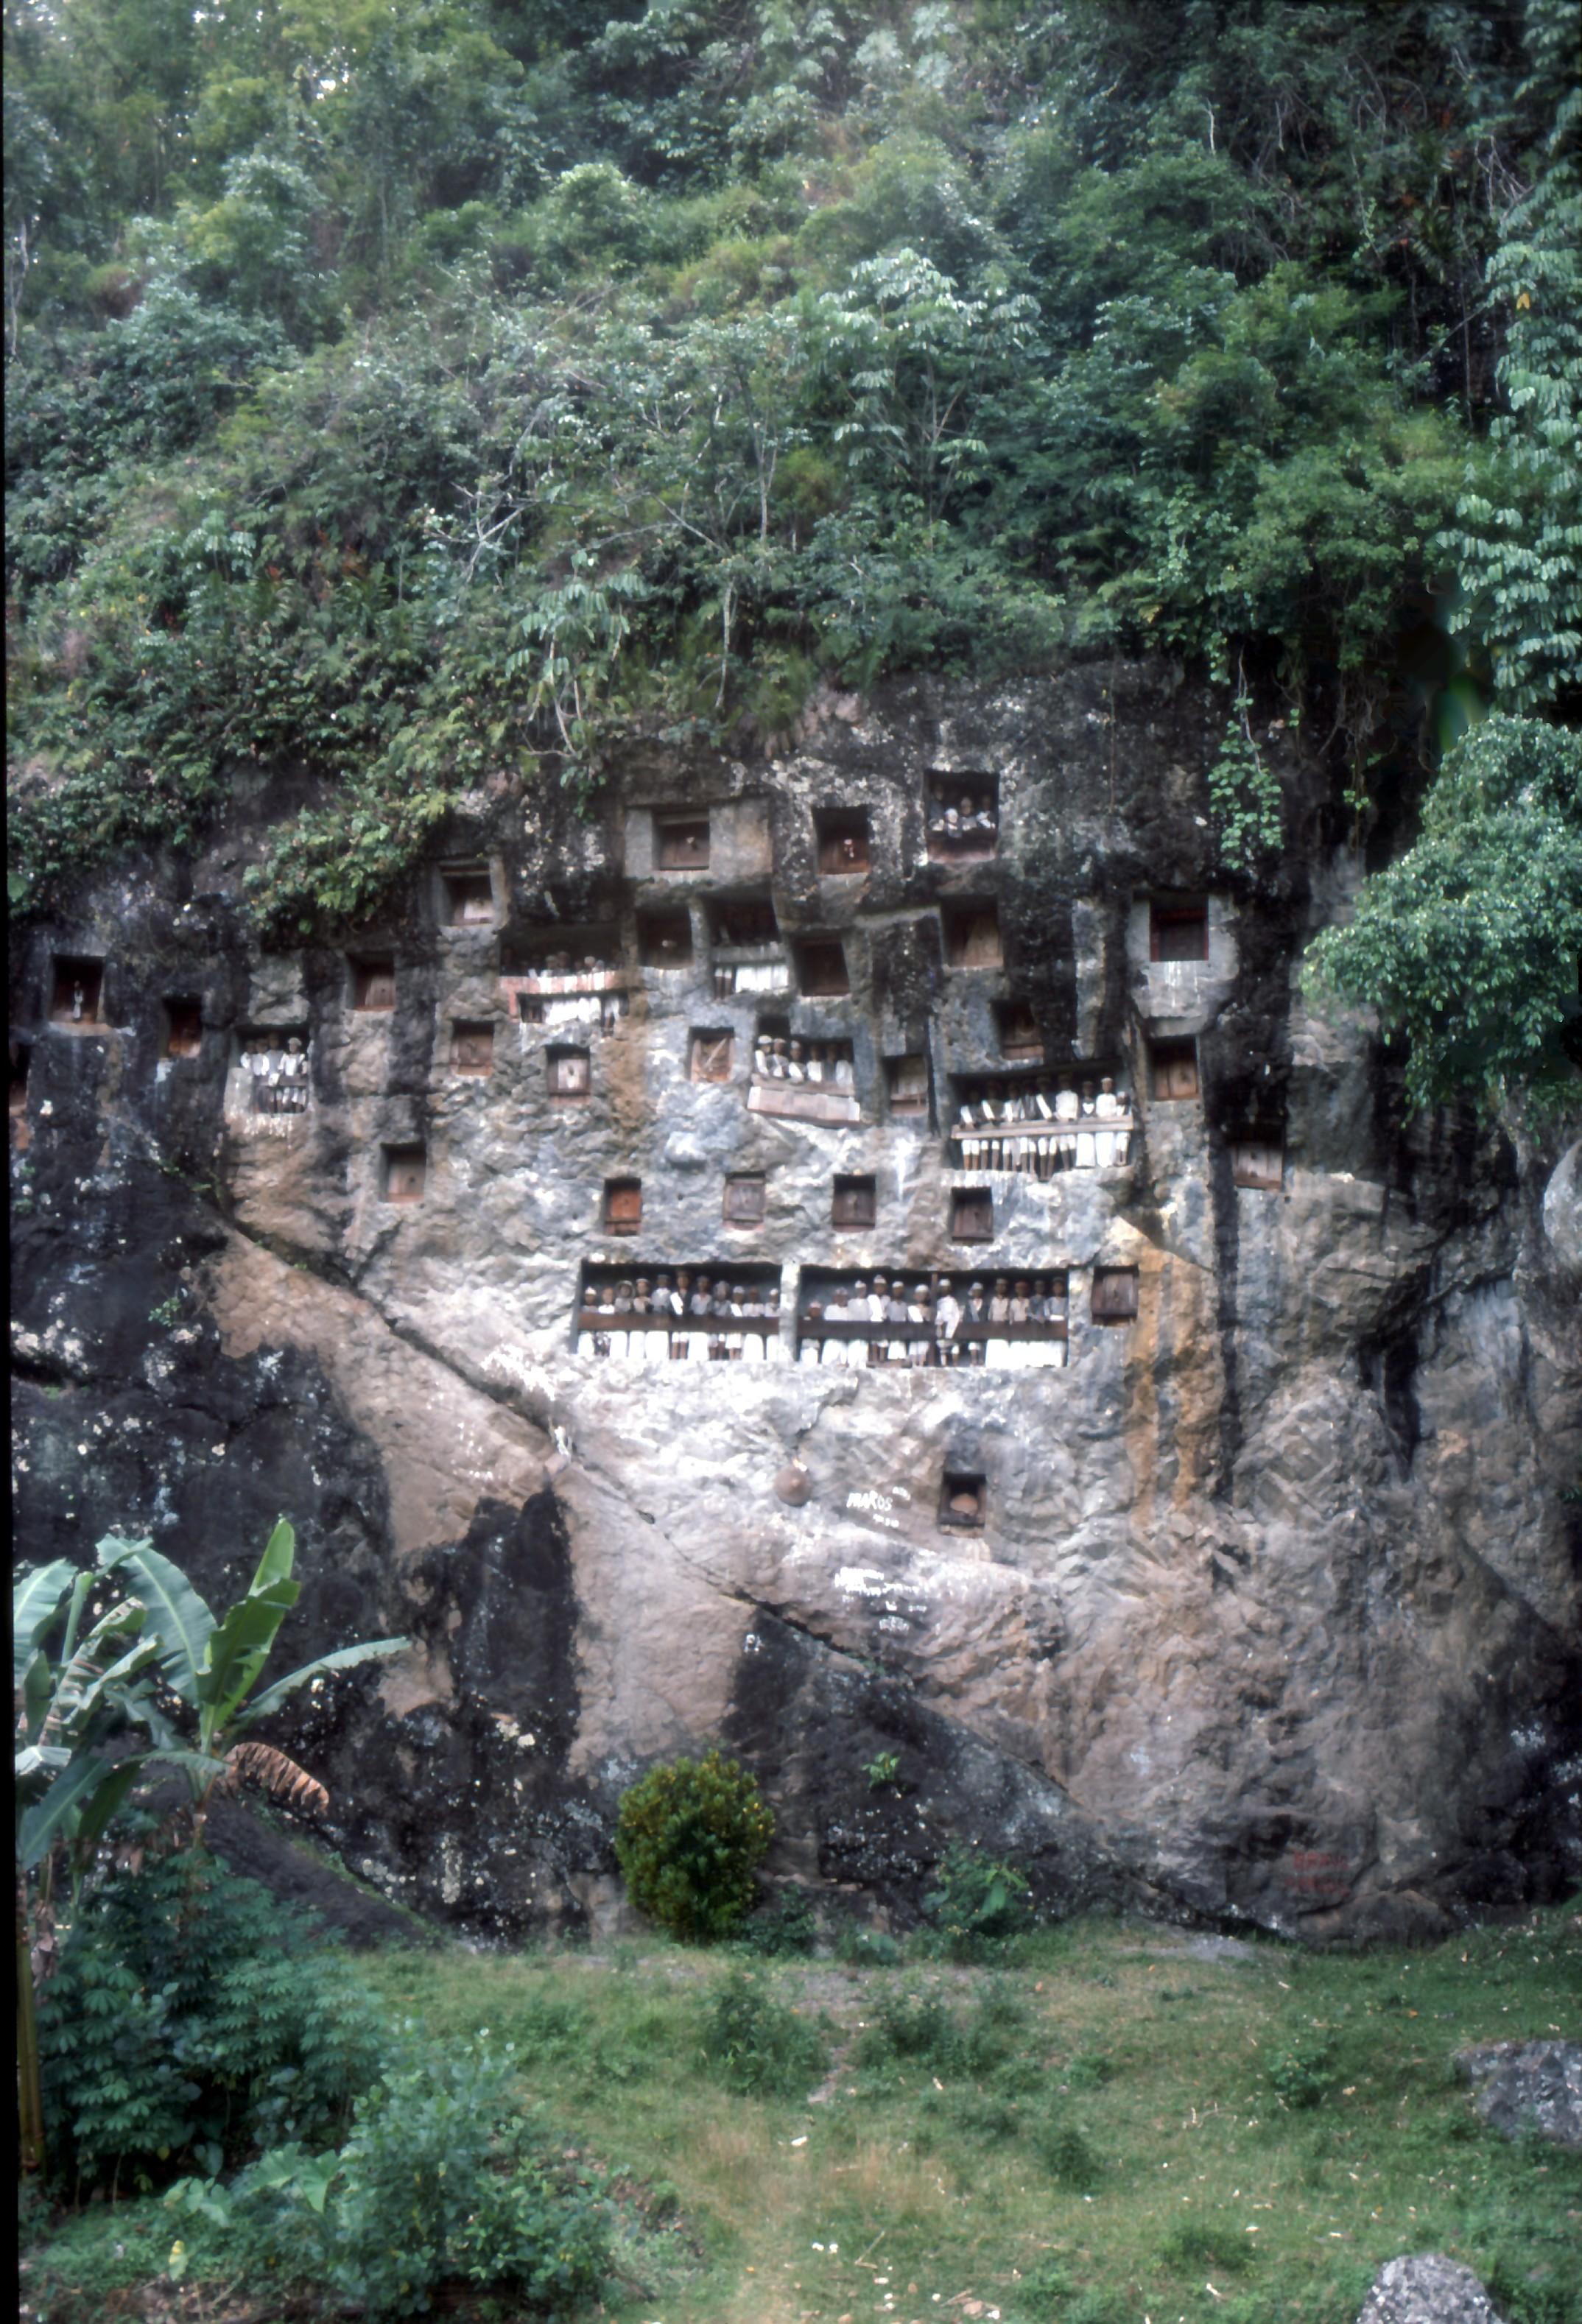 Les funérailles Toraja, Rantepao, Sulawesi, Indonésie